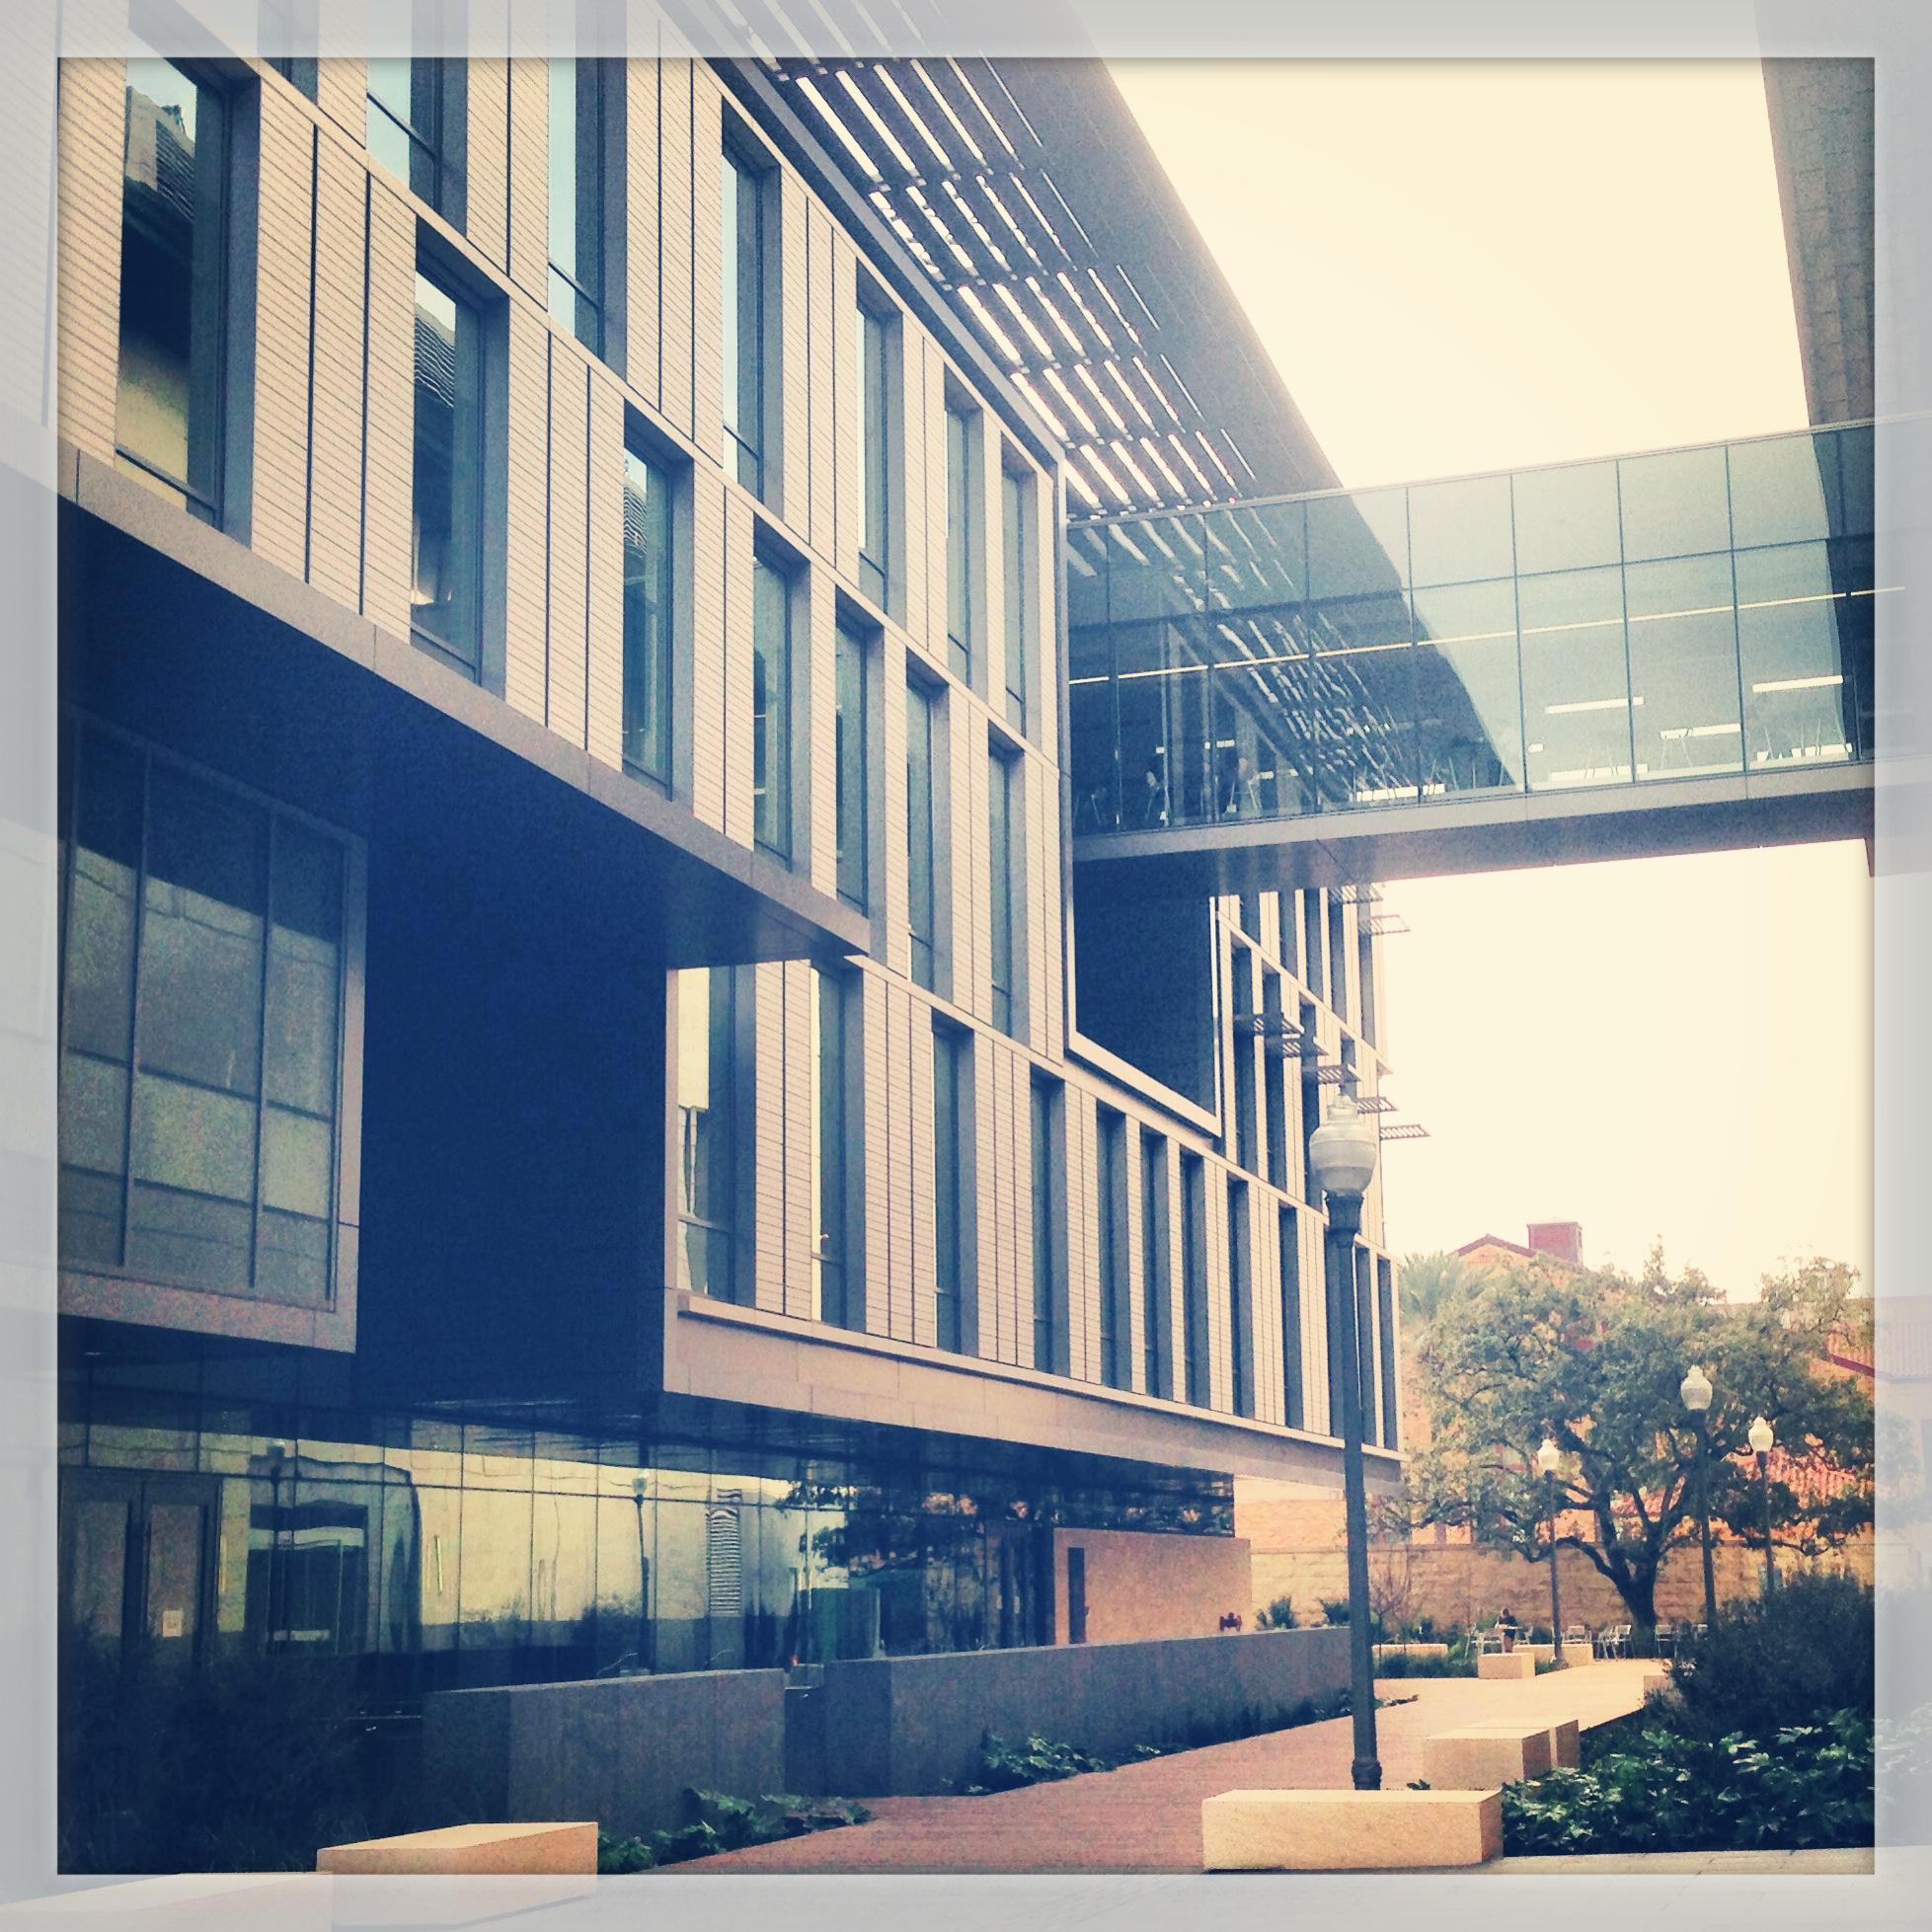 ... 16 Education Center | The University of Texas at Austin